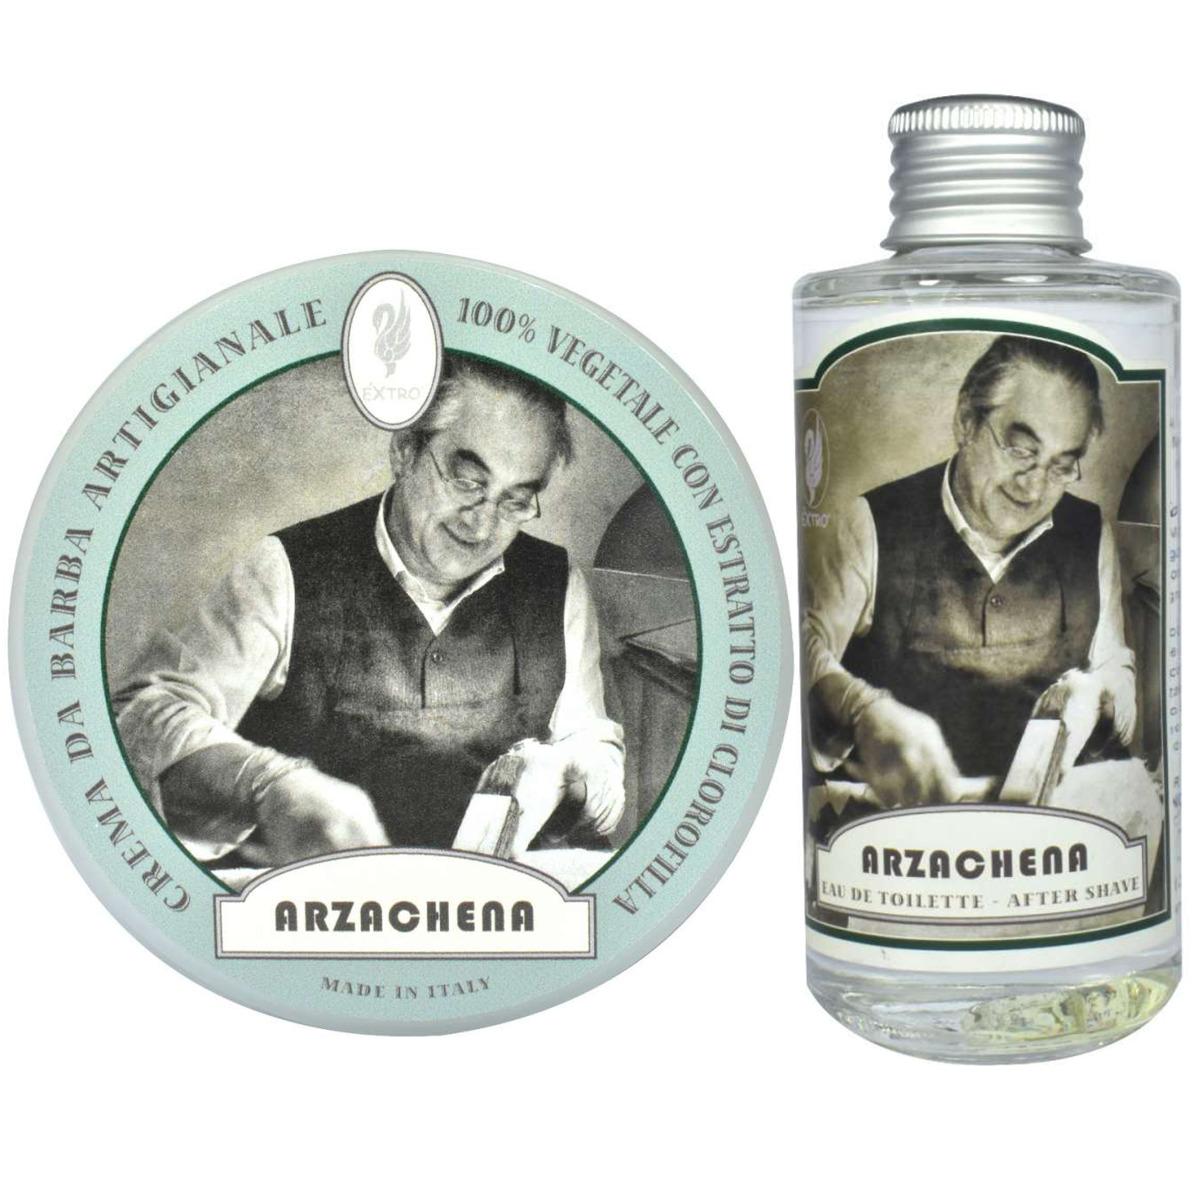 Extro Cosmesi Arzachena Shaving Cream & Aftershave Set